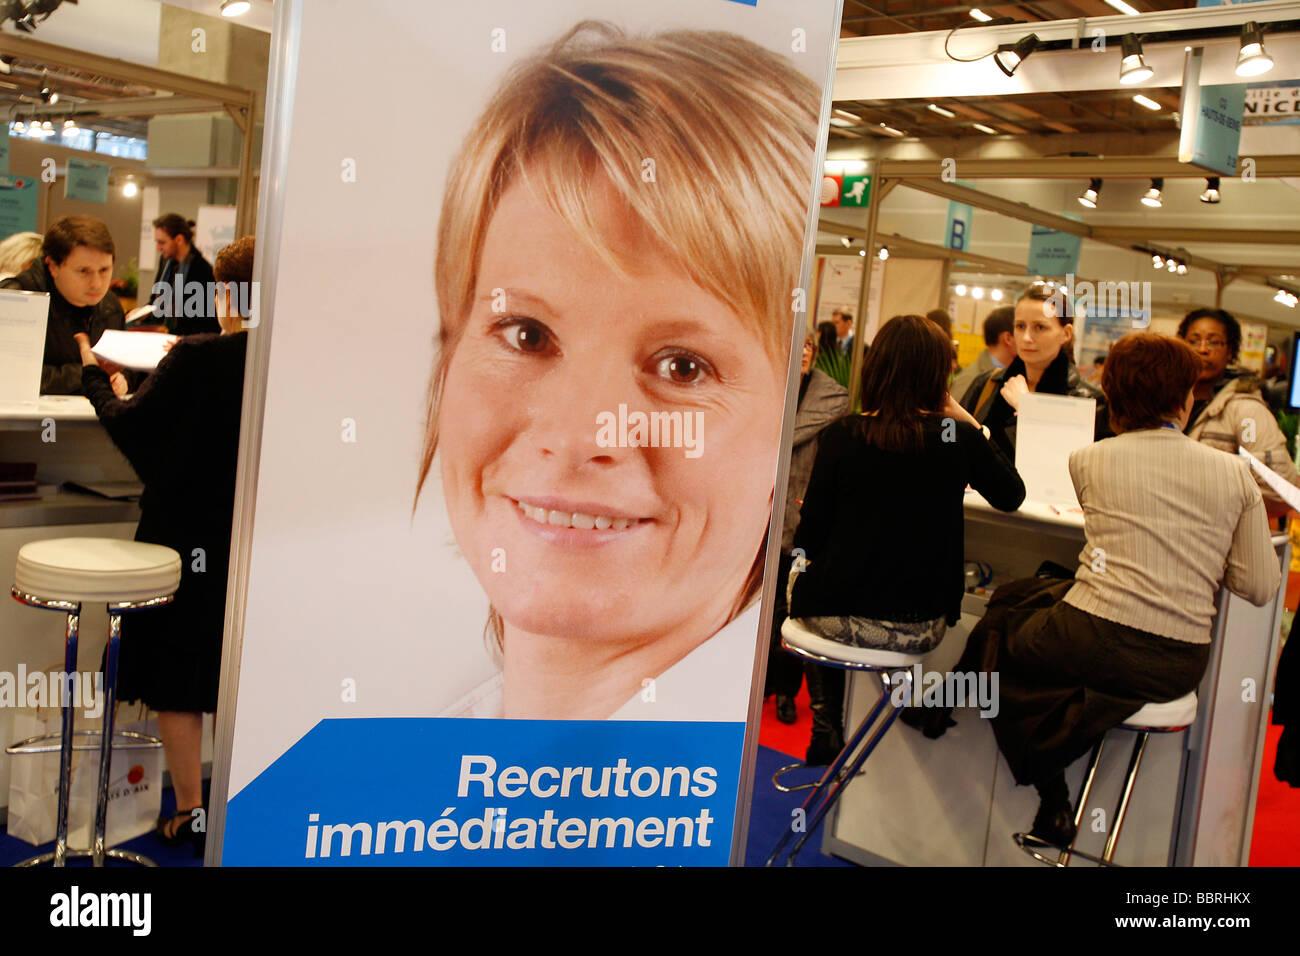 Resumes Stockfotos & Resumes Bilder - Alamy